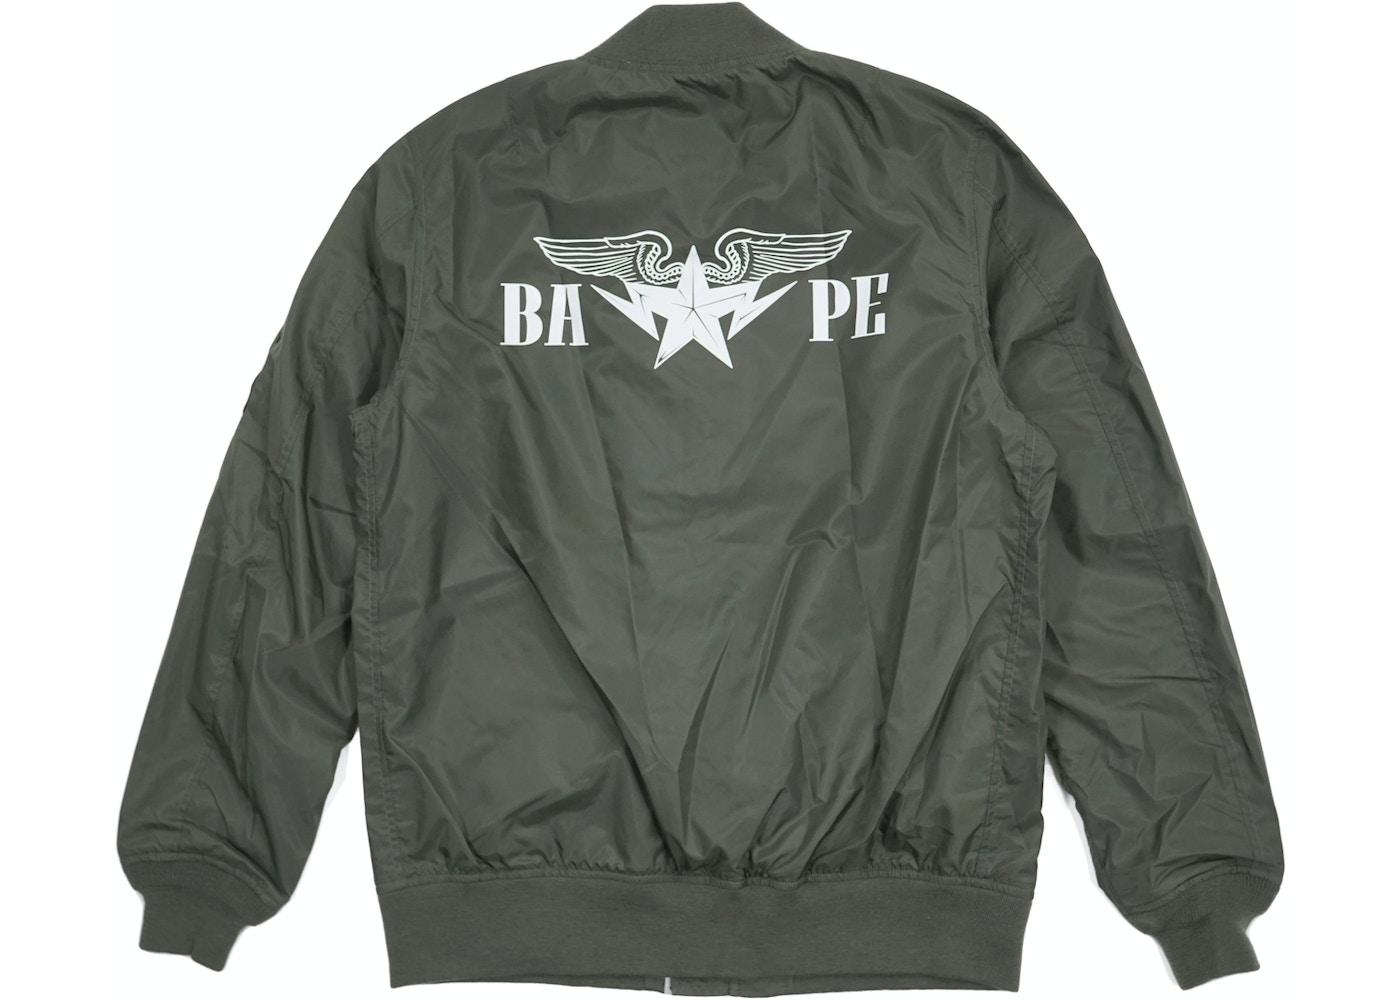 72cee78909b Streetwear - Bape Jackets - Most Popular